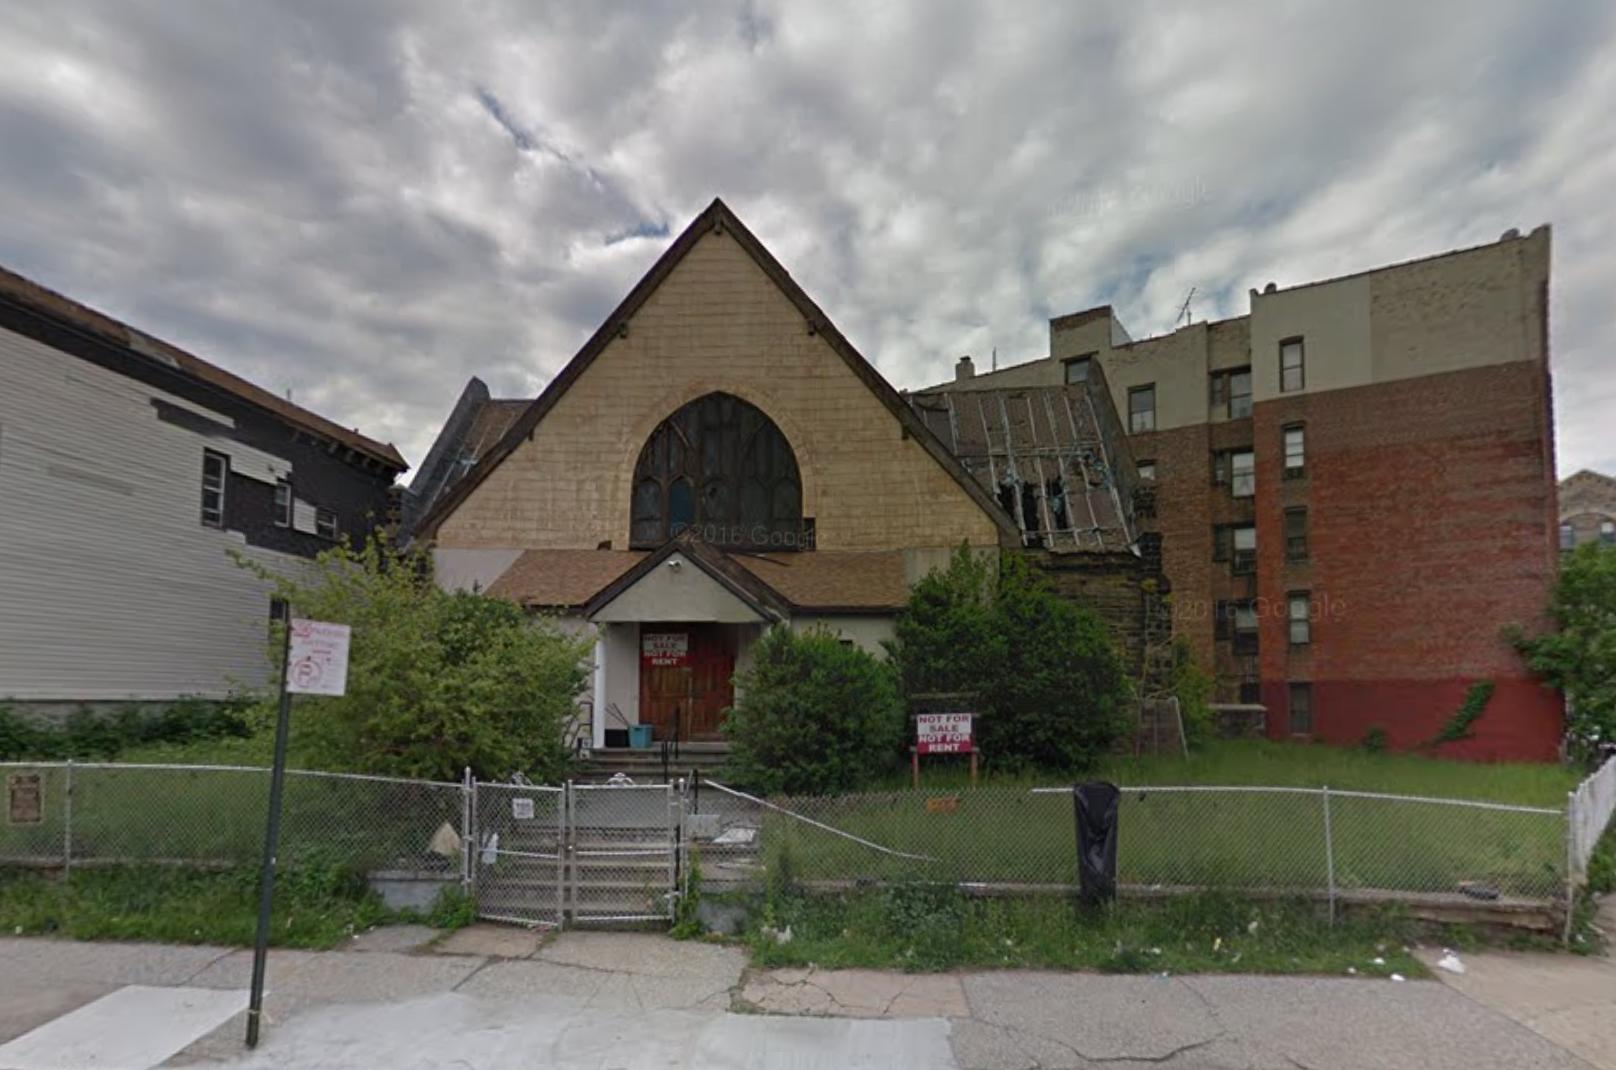 1017 Home Street, image via Google Maps